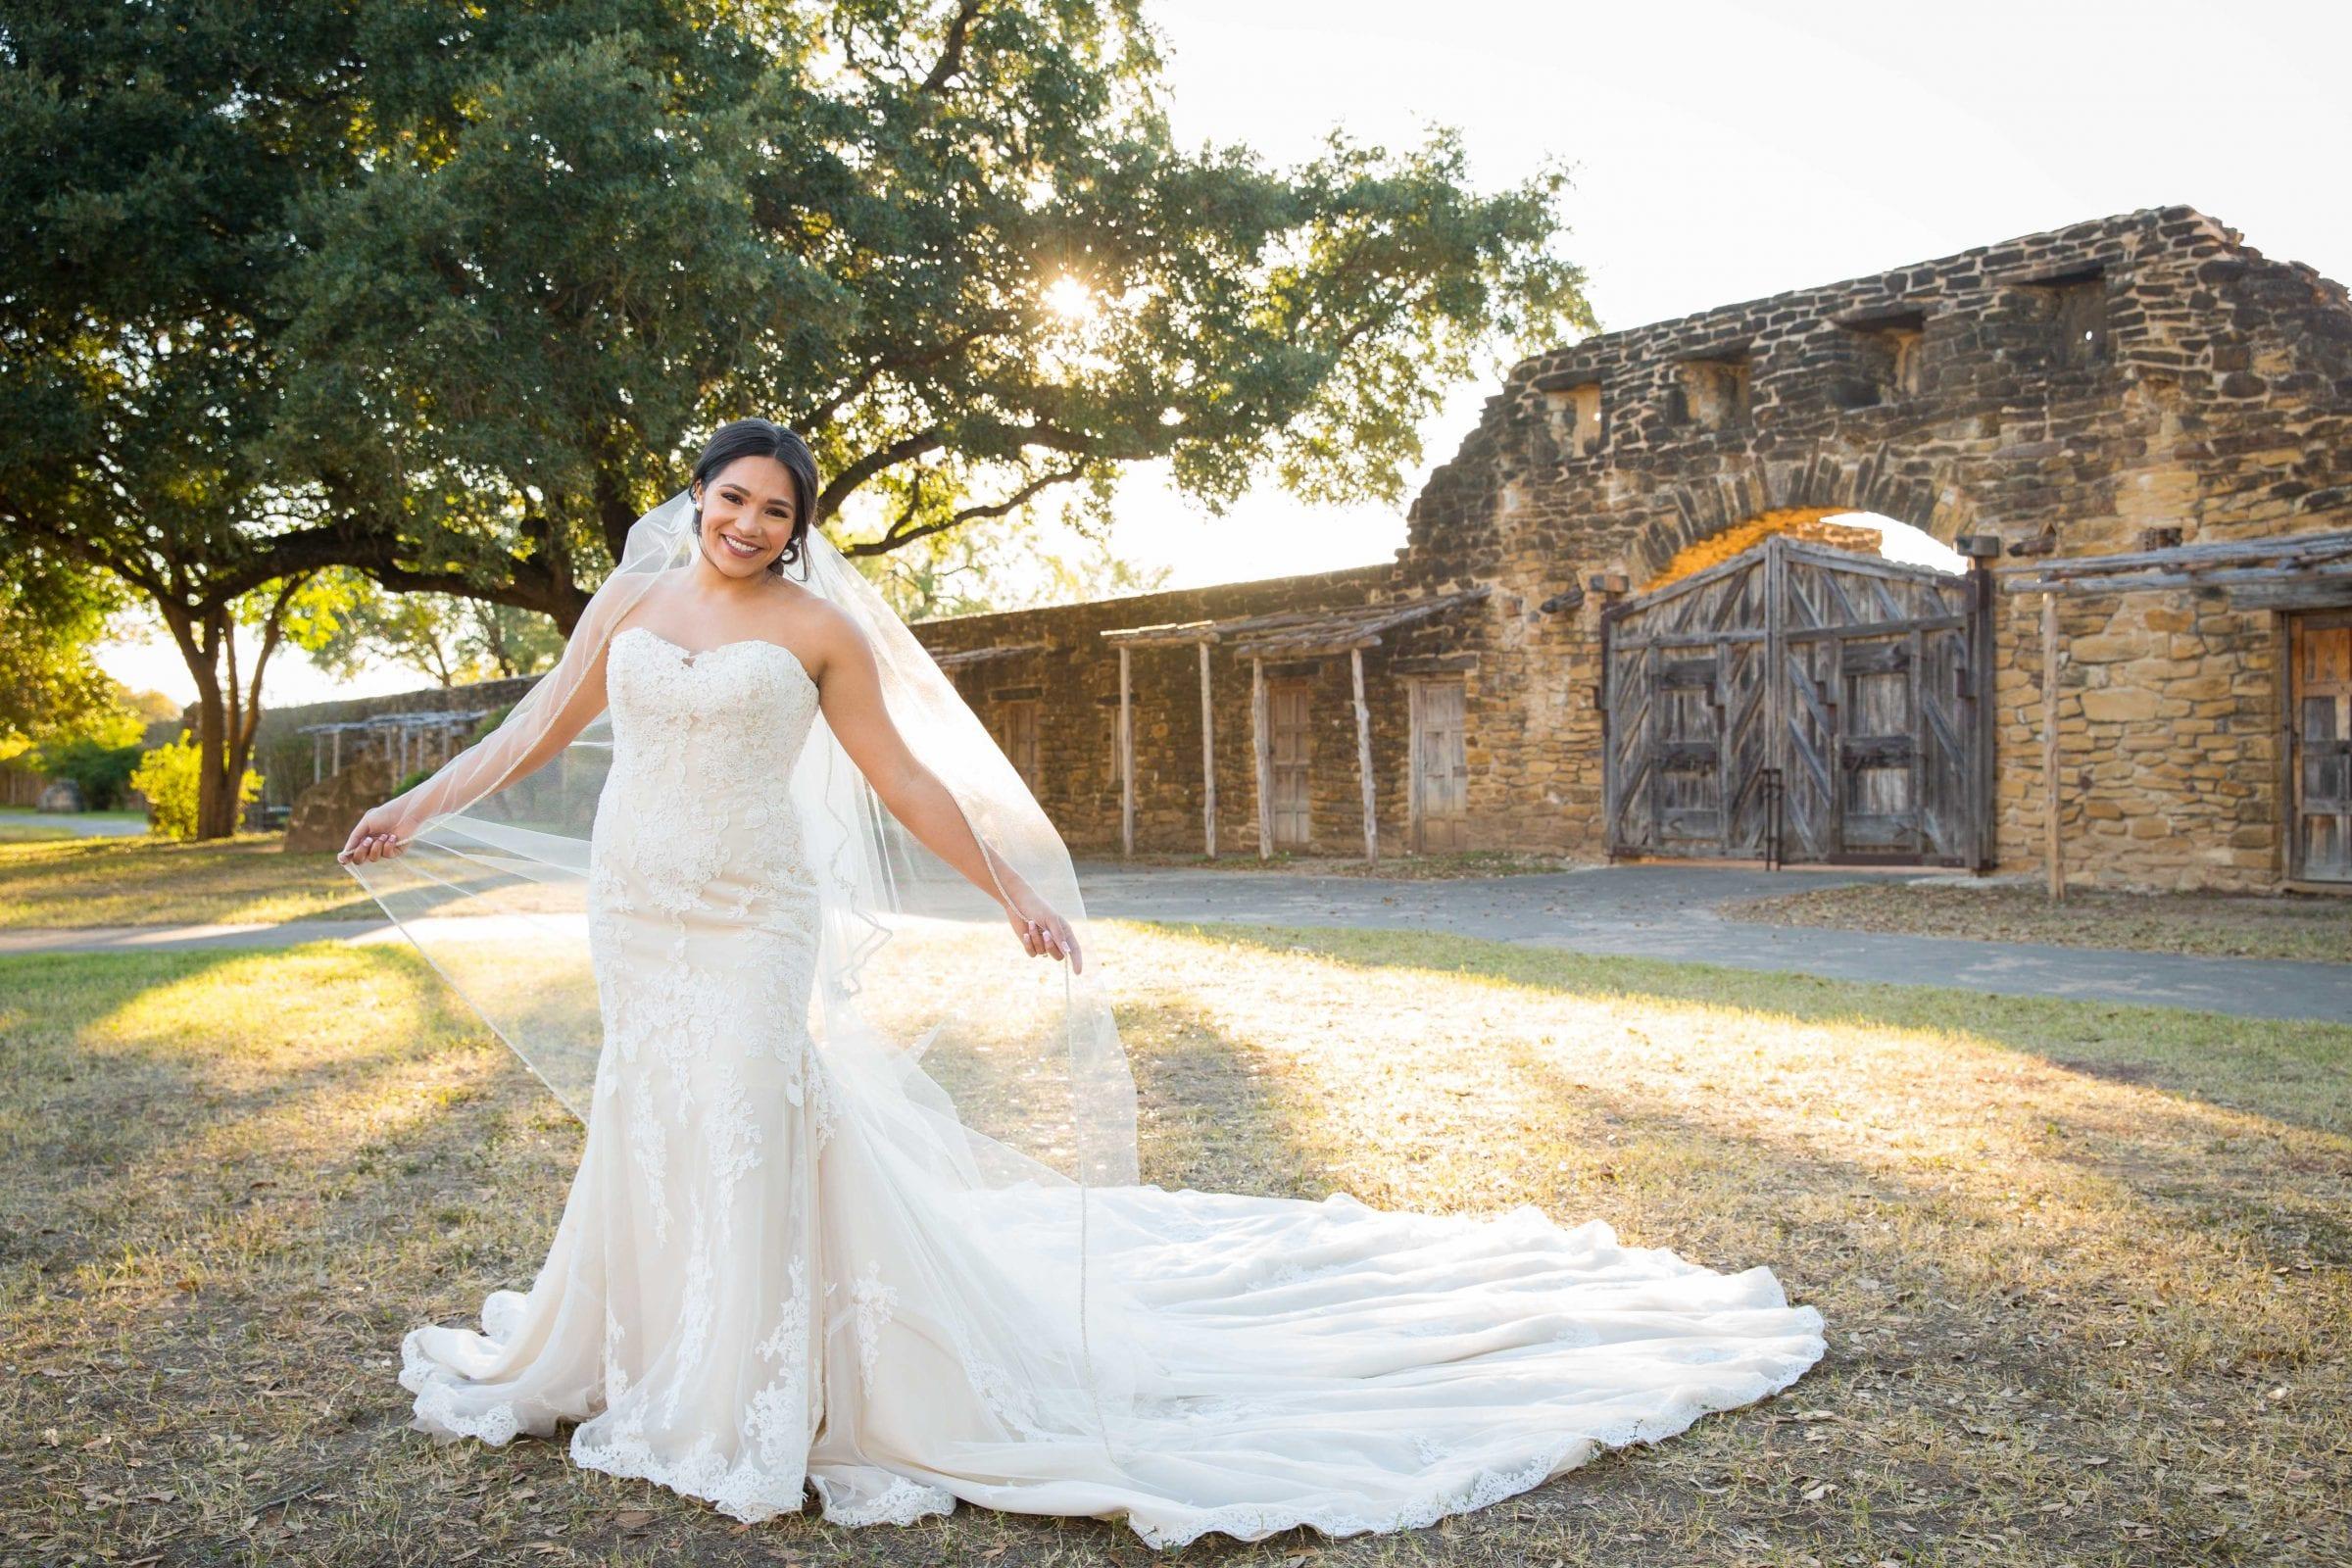 Kristen H Bridal holding veil Mission San Jose